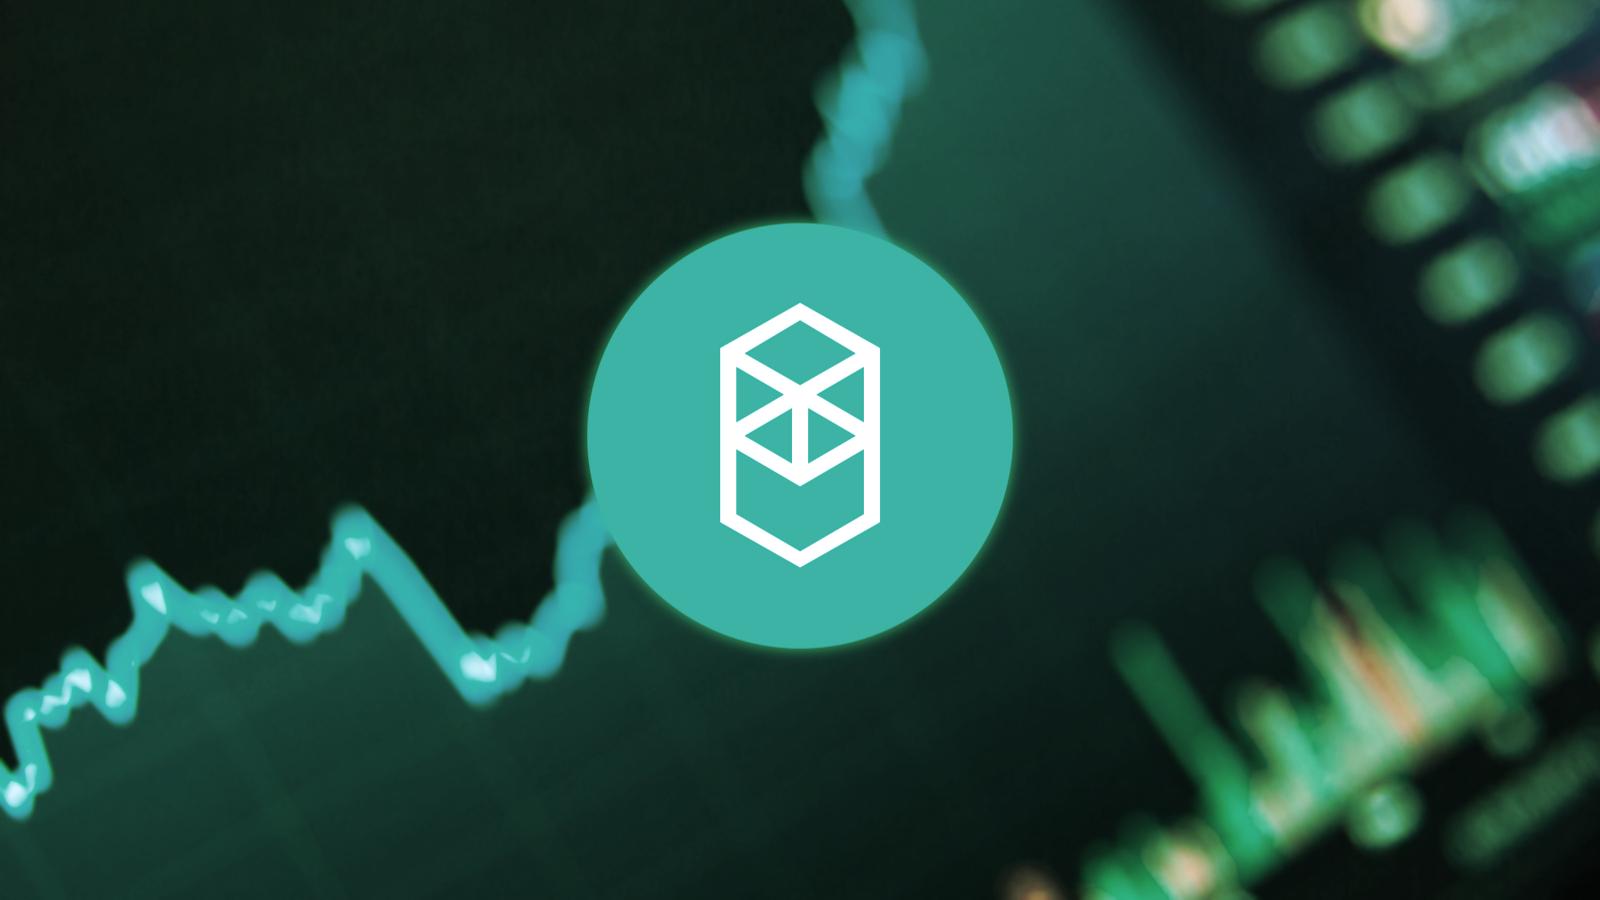 Fantom Token Jumps 50% After Launching $315 Million DeFi Program